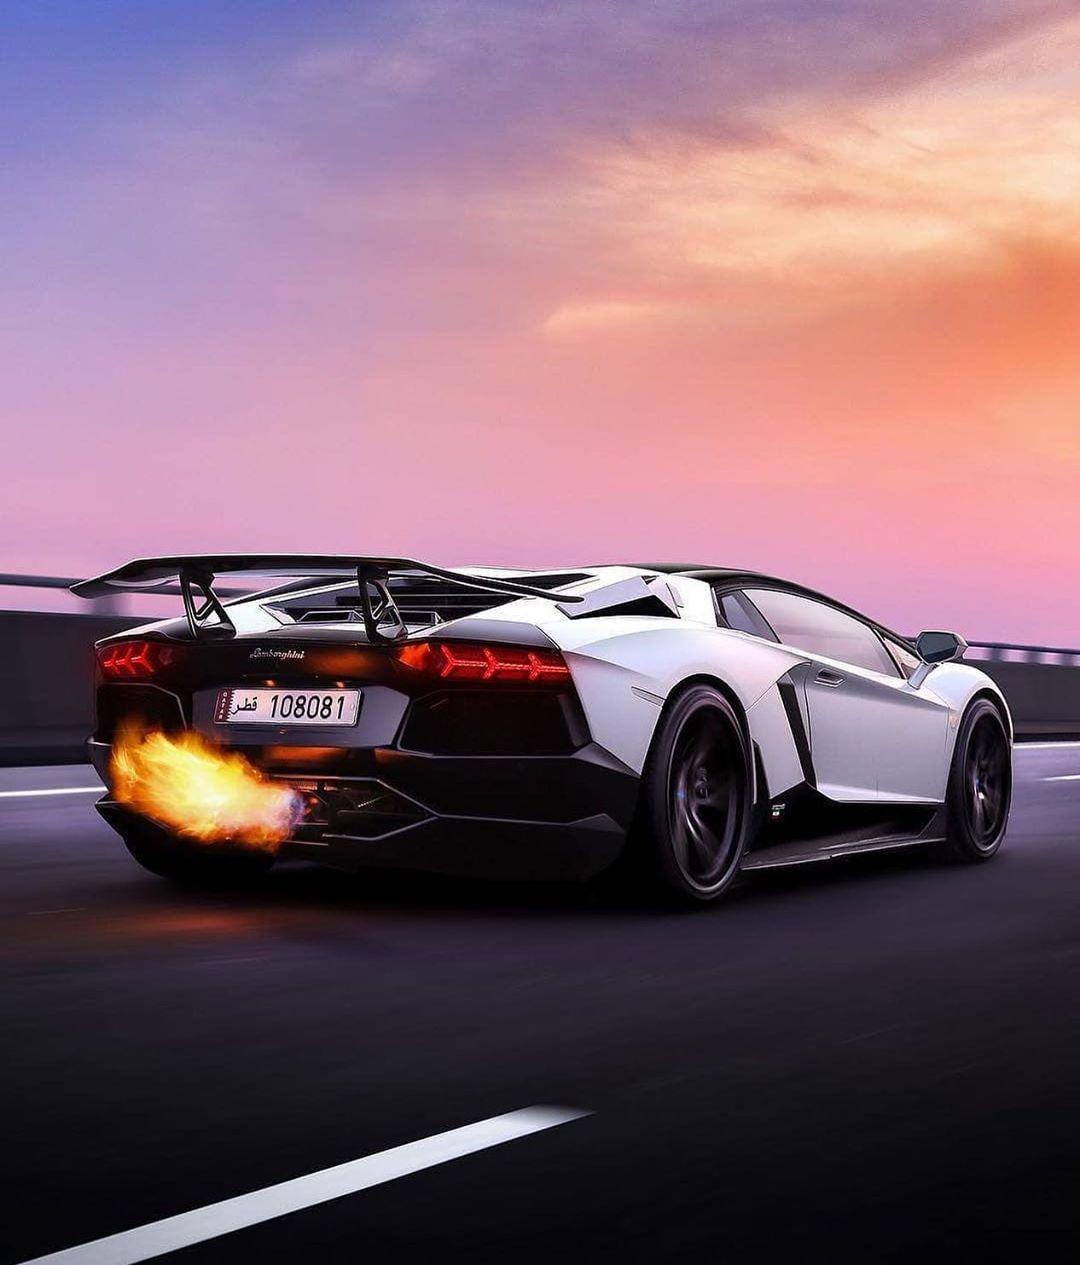 Lamborghini Supercar Ferrari Dewakartu Aventador Huracan Compare Cars Super Cars Car Rental